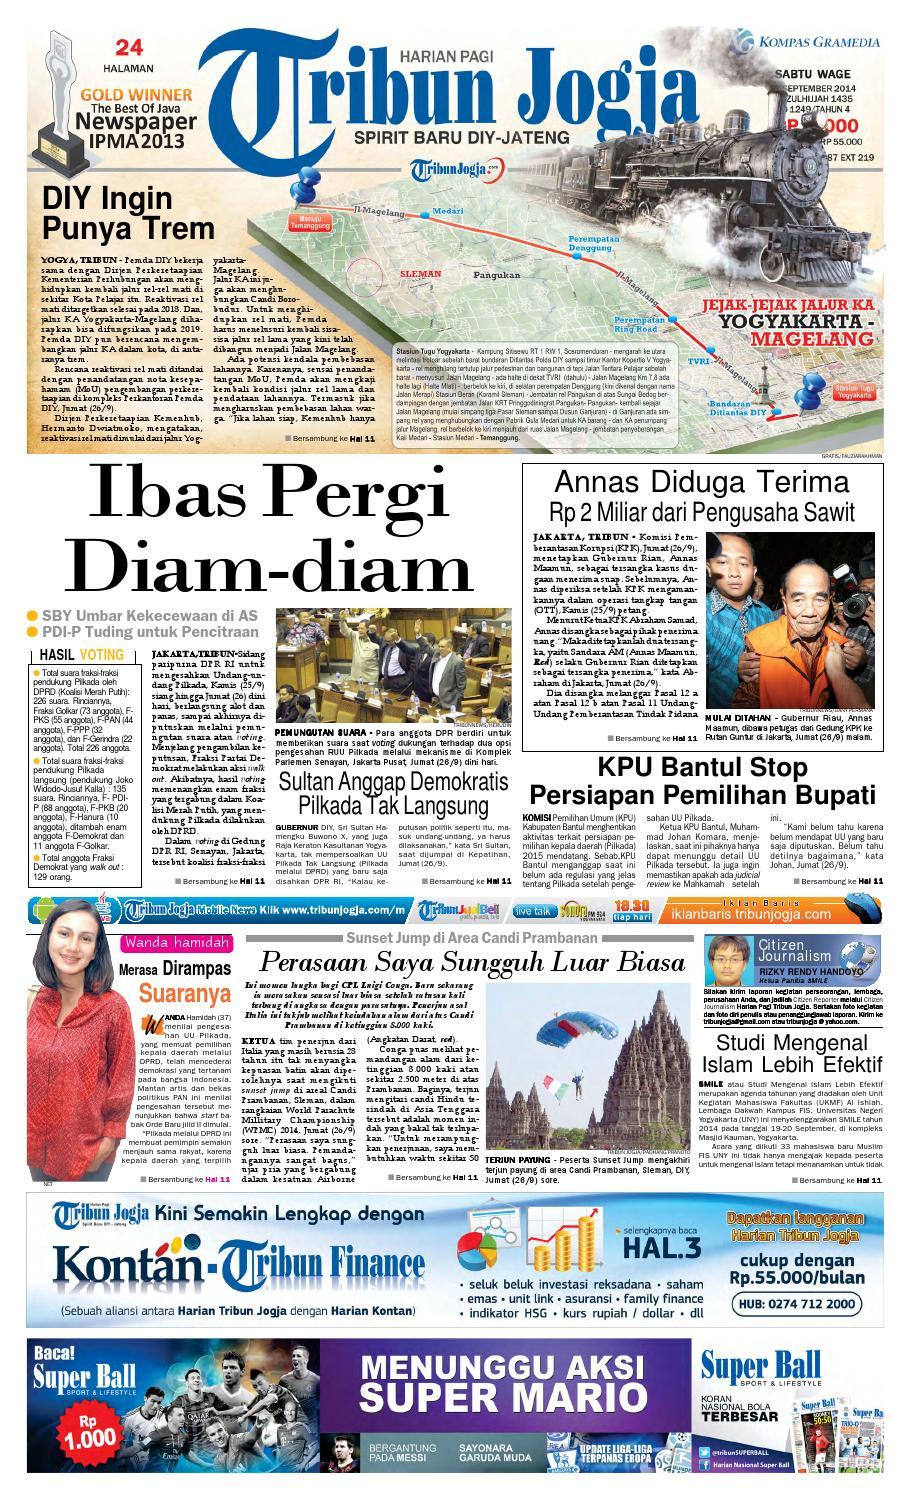 Tribunjogja 27 09 2014 By Tribun Jogja Issuu Rkb Bni Tegal Kranjang Buah Nur Fashion And Art